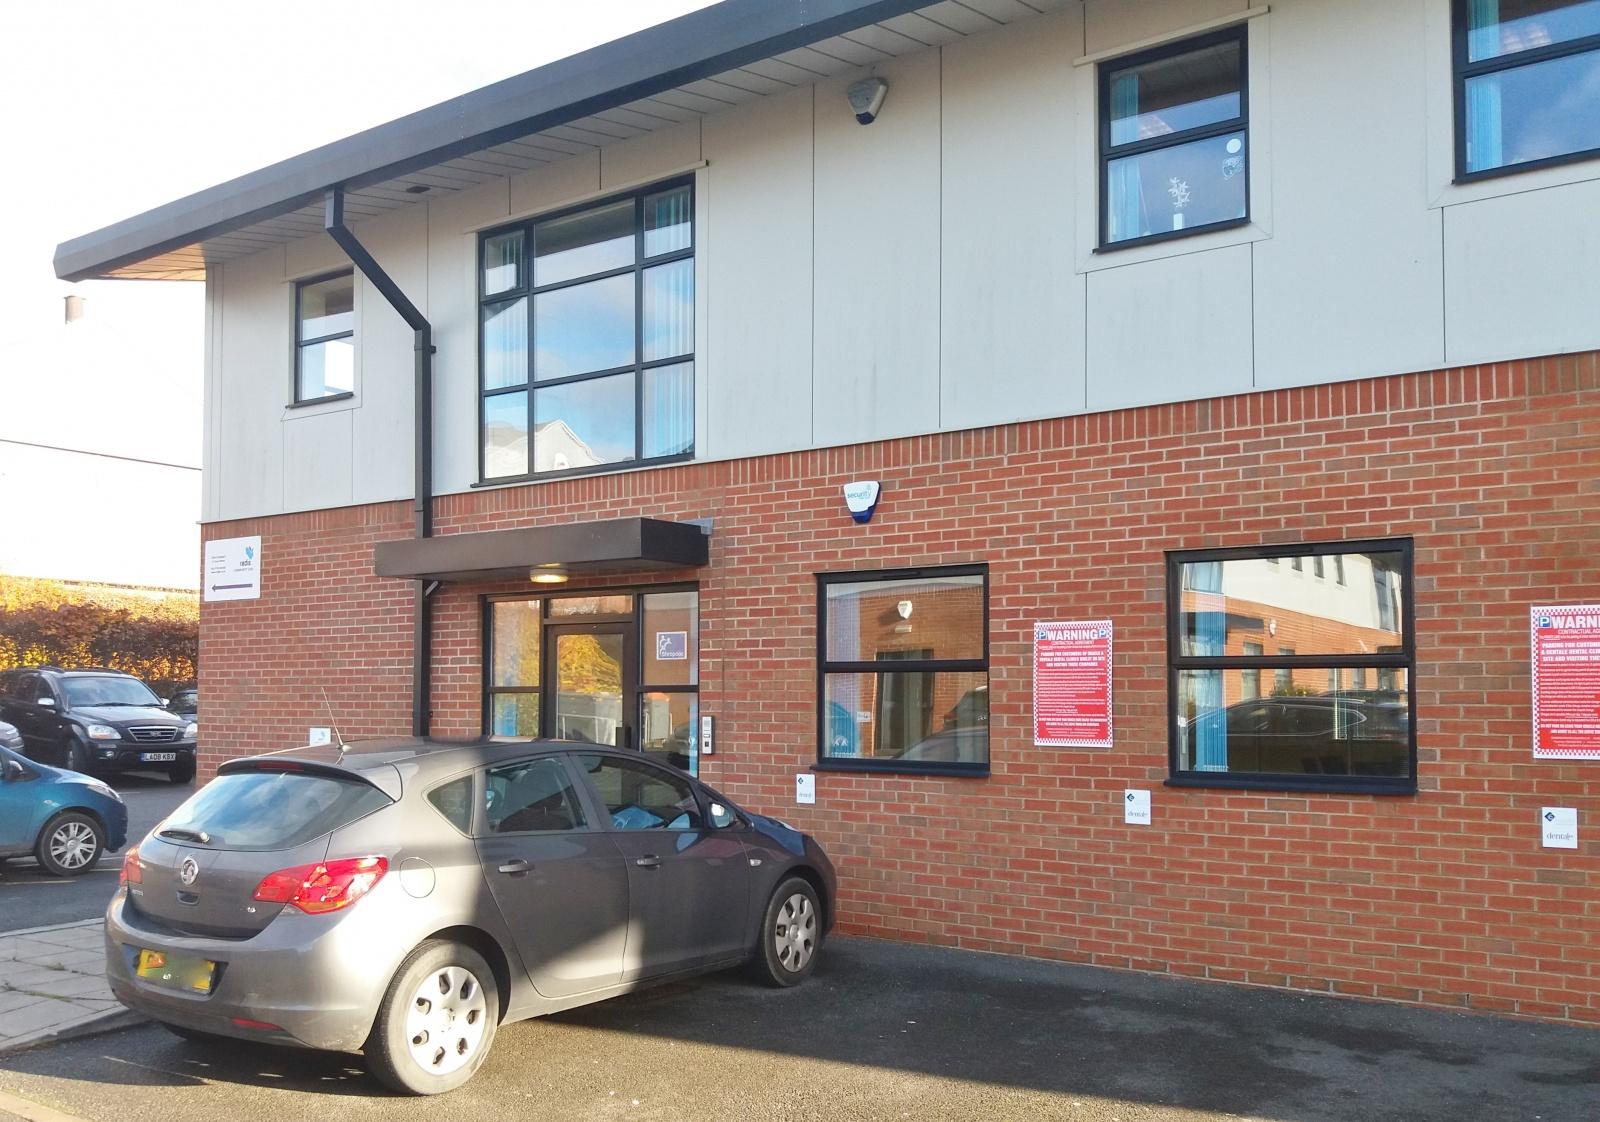 Suite 1, Unit 12, Longbow Professional Centre, Shrewsbury, Shropshire